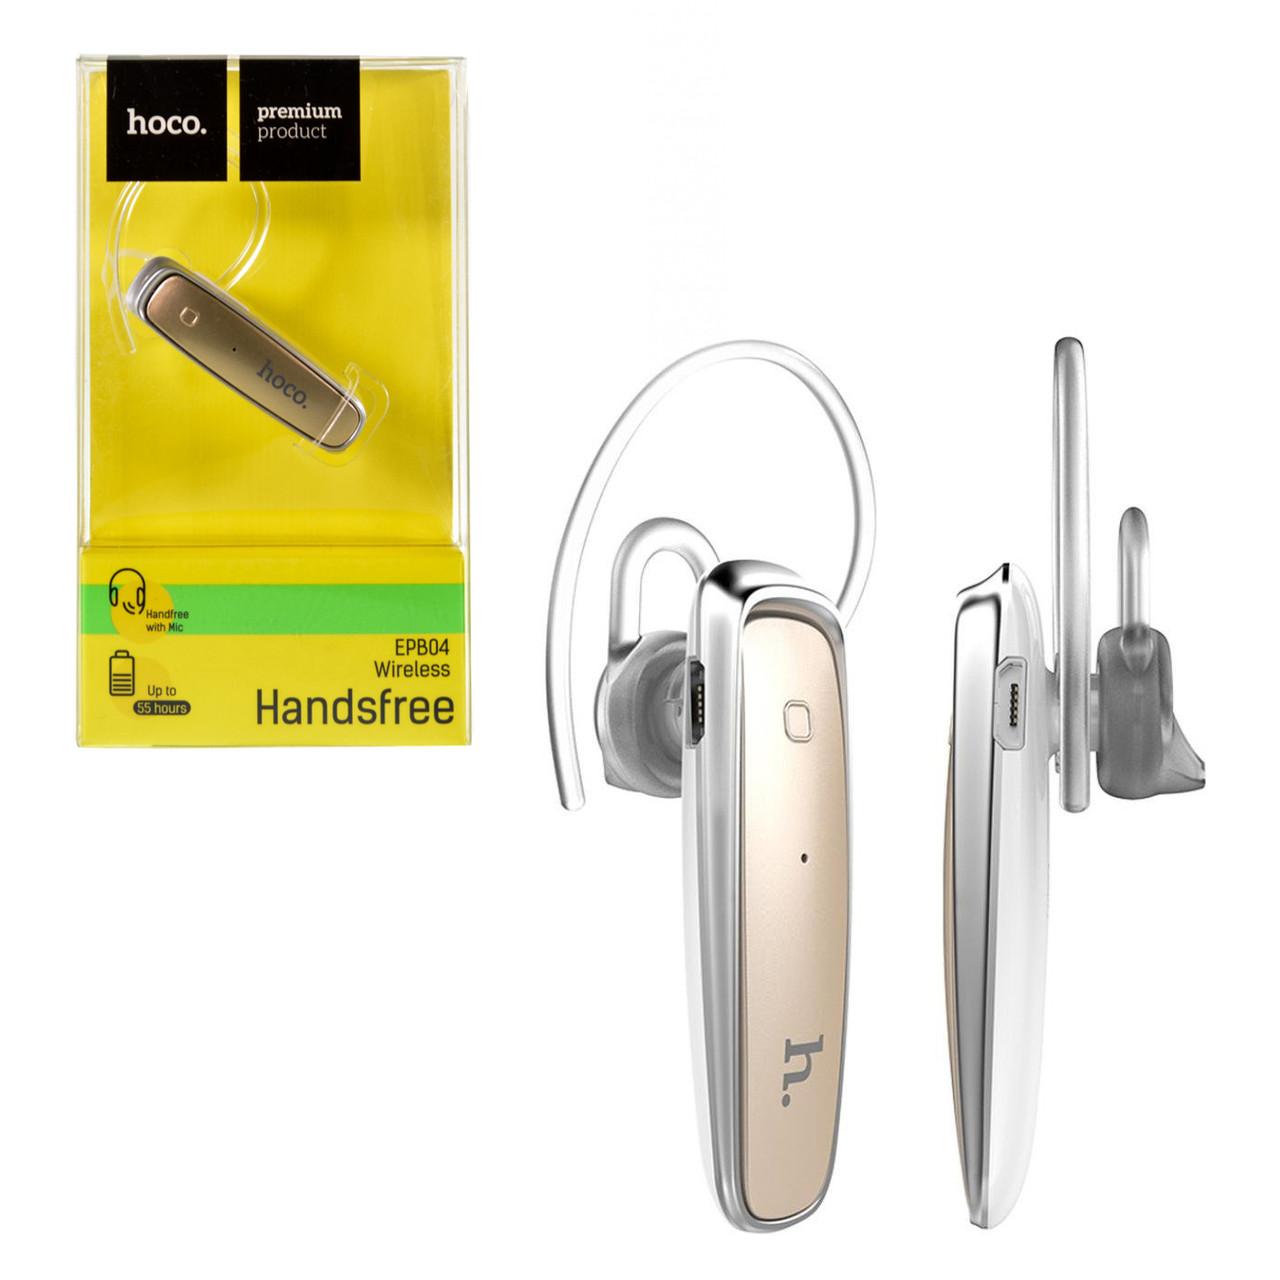 Bluetooth гарнитура Hoco EPB04 Premium product Gold